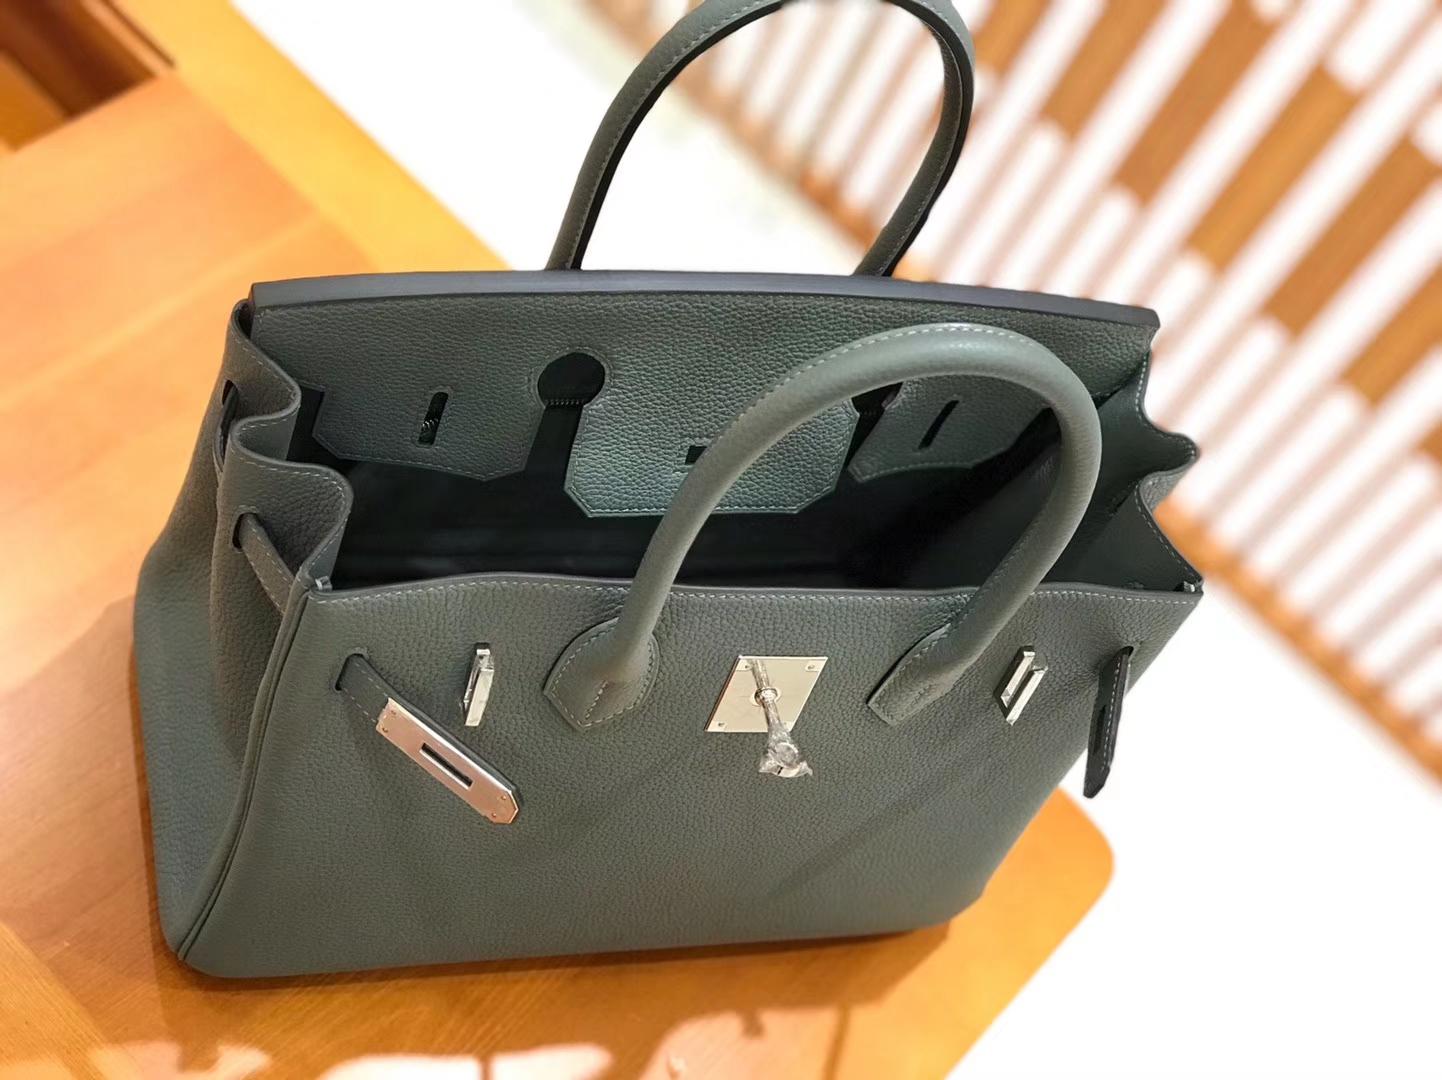 Hermès(爱马仕)Birkin 30cm togo牛皮 杏仁绿 银扣 全手工缝制